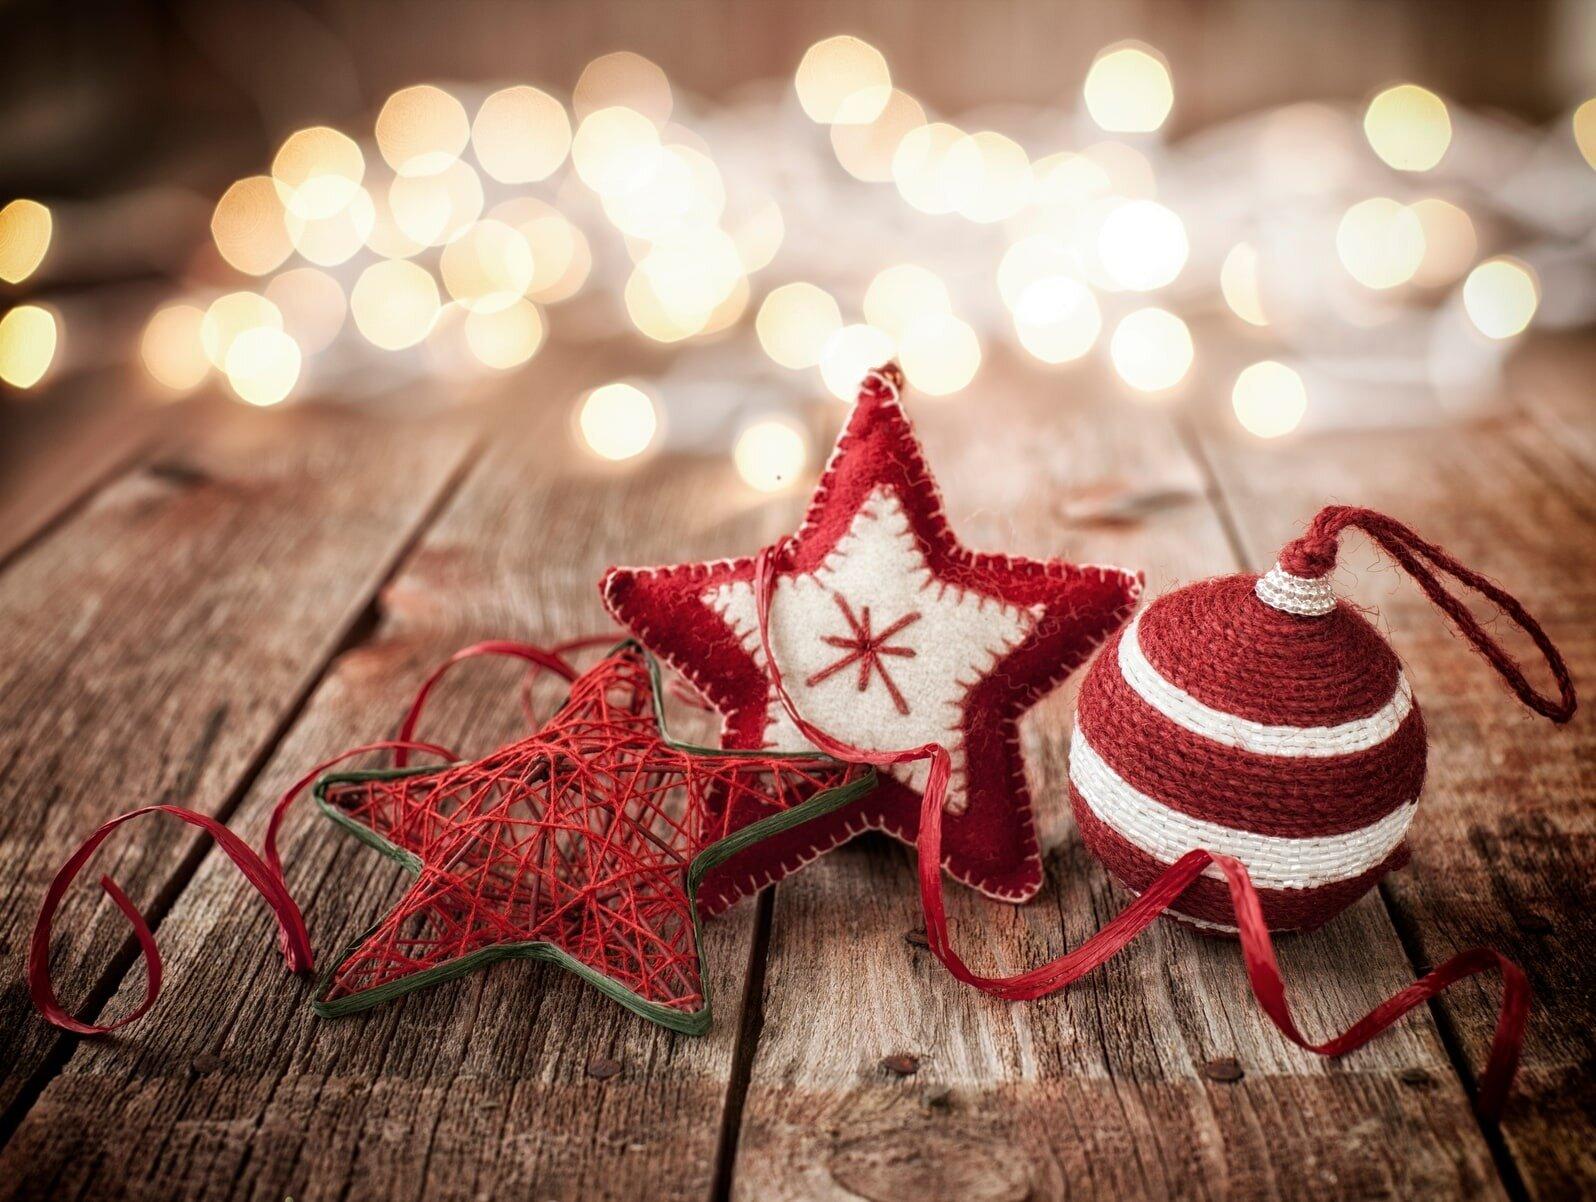 Natale 2020 - I nostri auguri speciali per voi